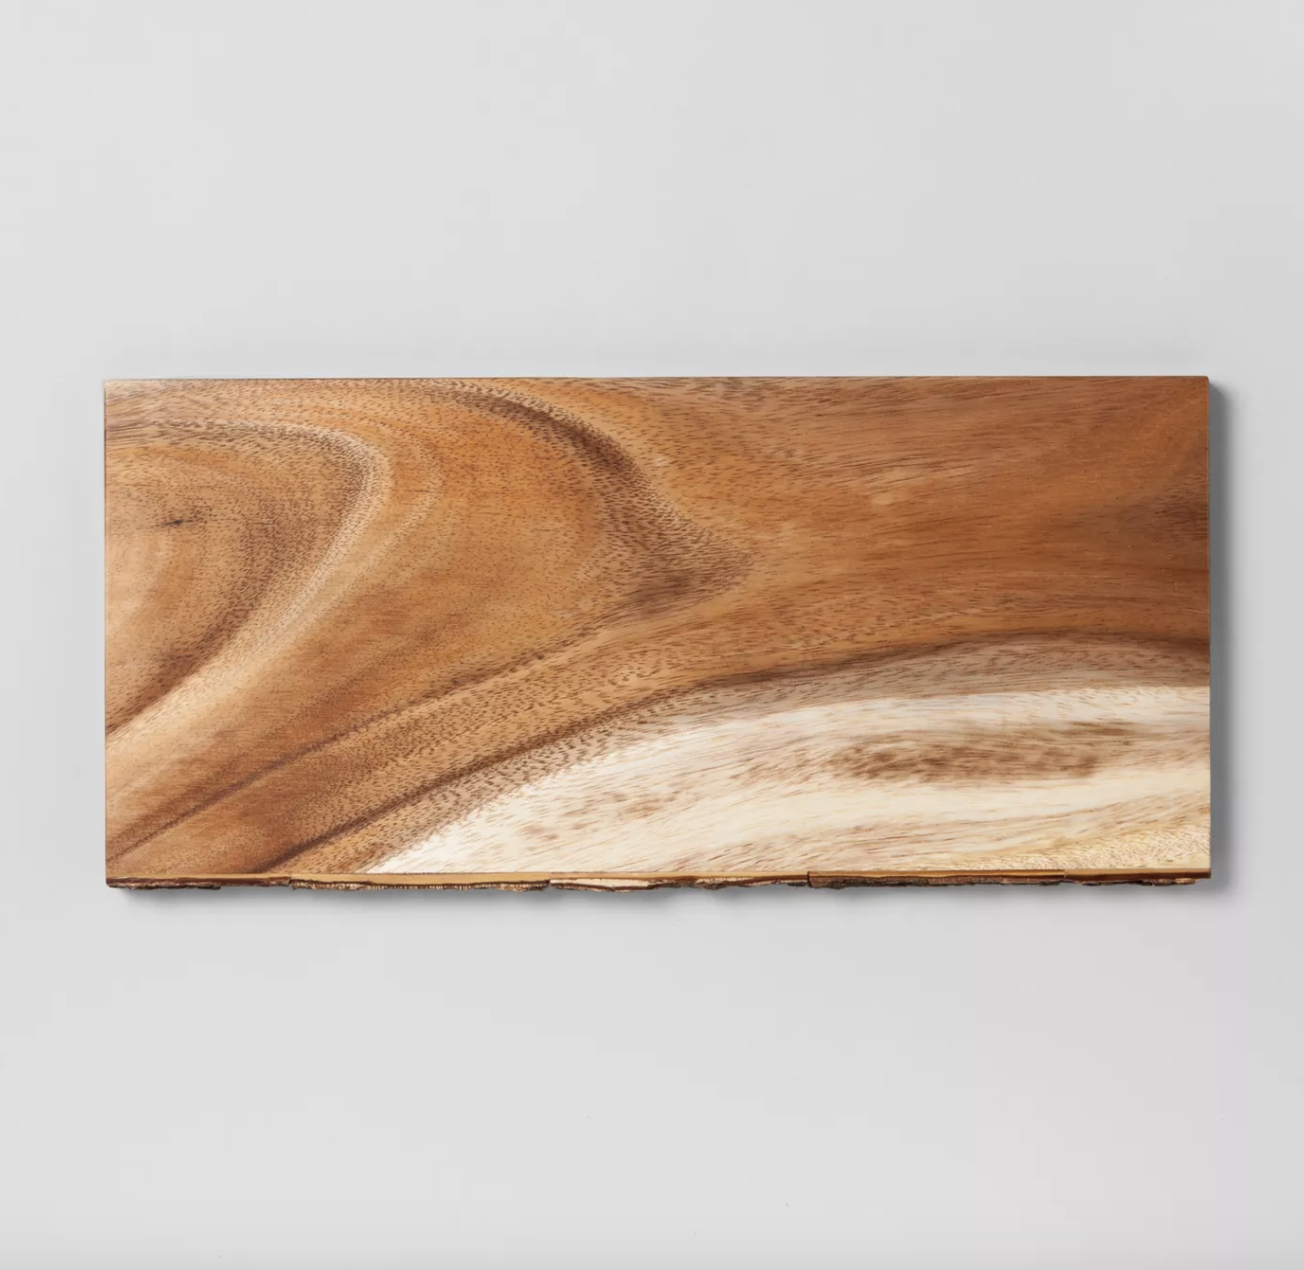 the acacia board